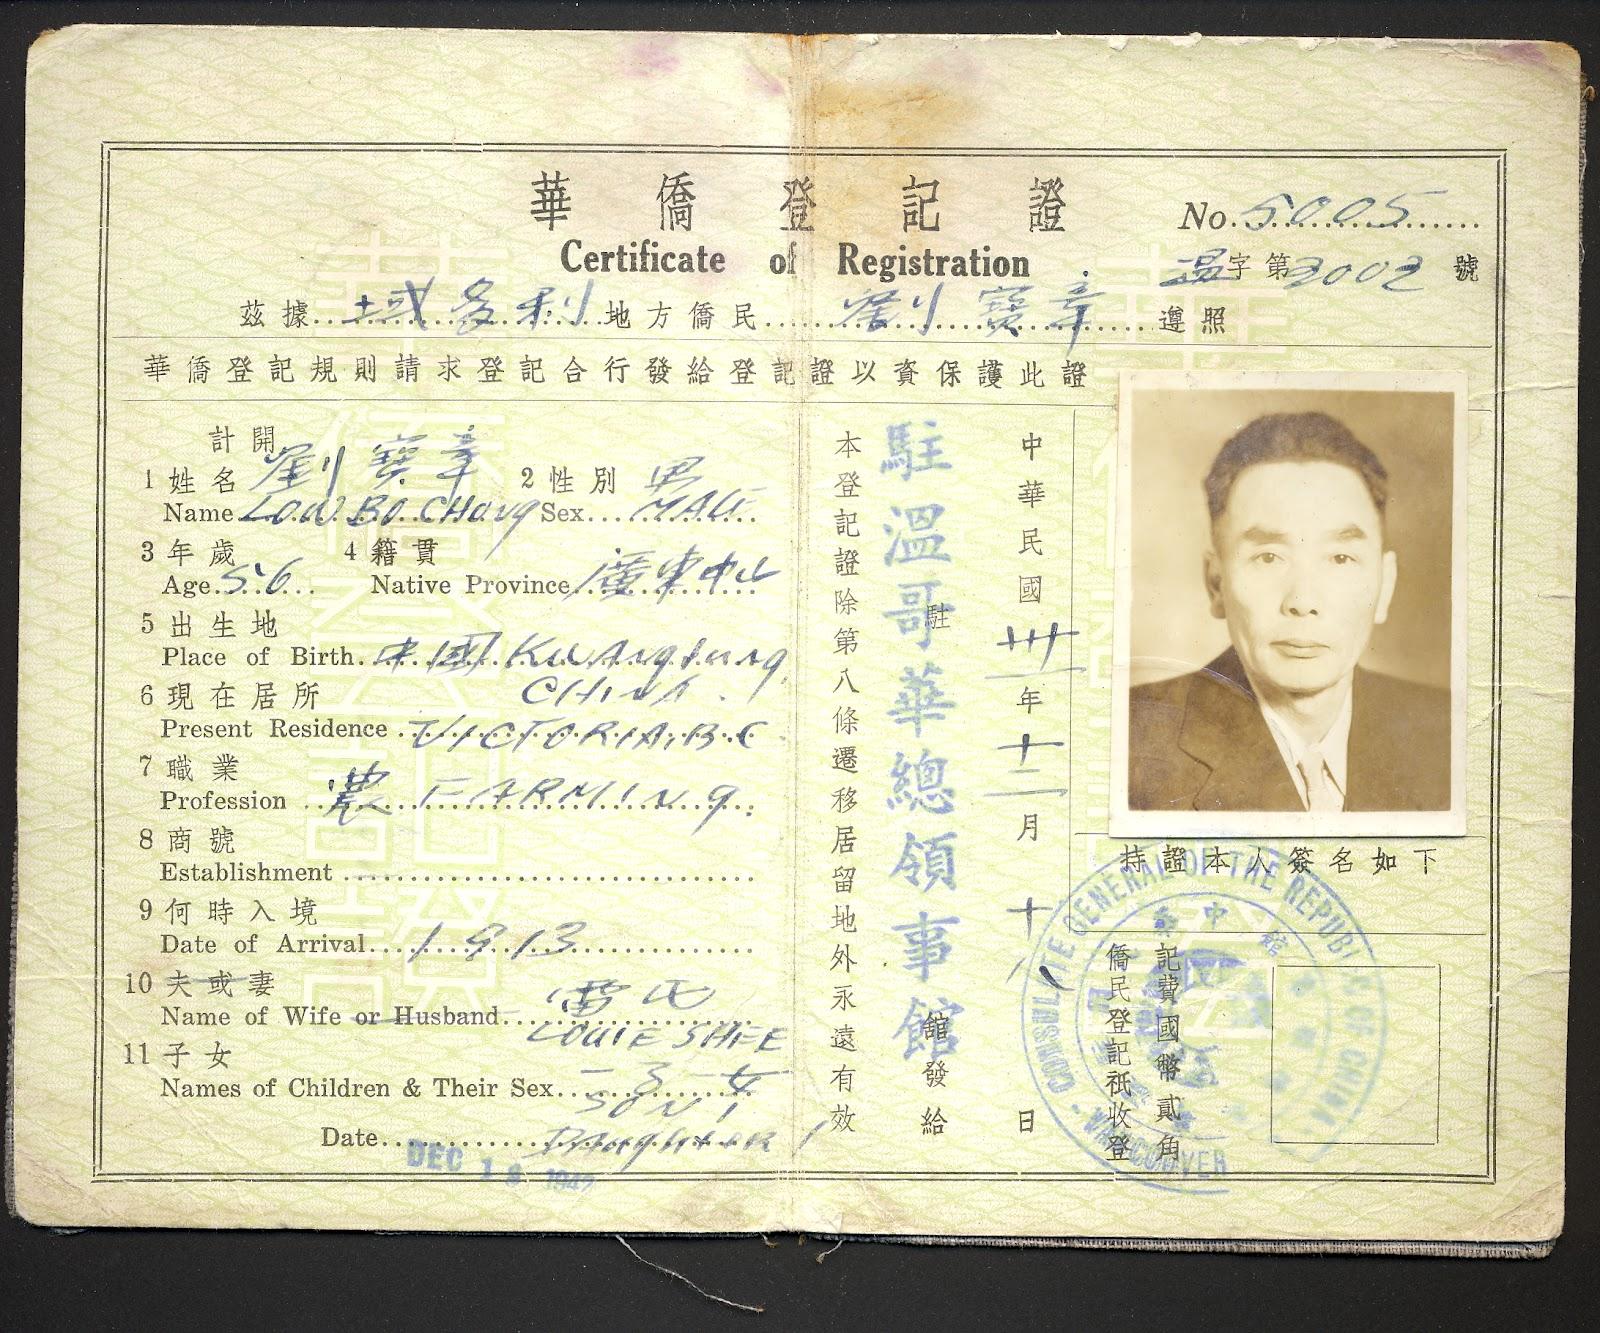 Bjarne Tokerud Bookseller: Seeking old Chinatown documents, photos ...